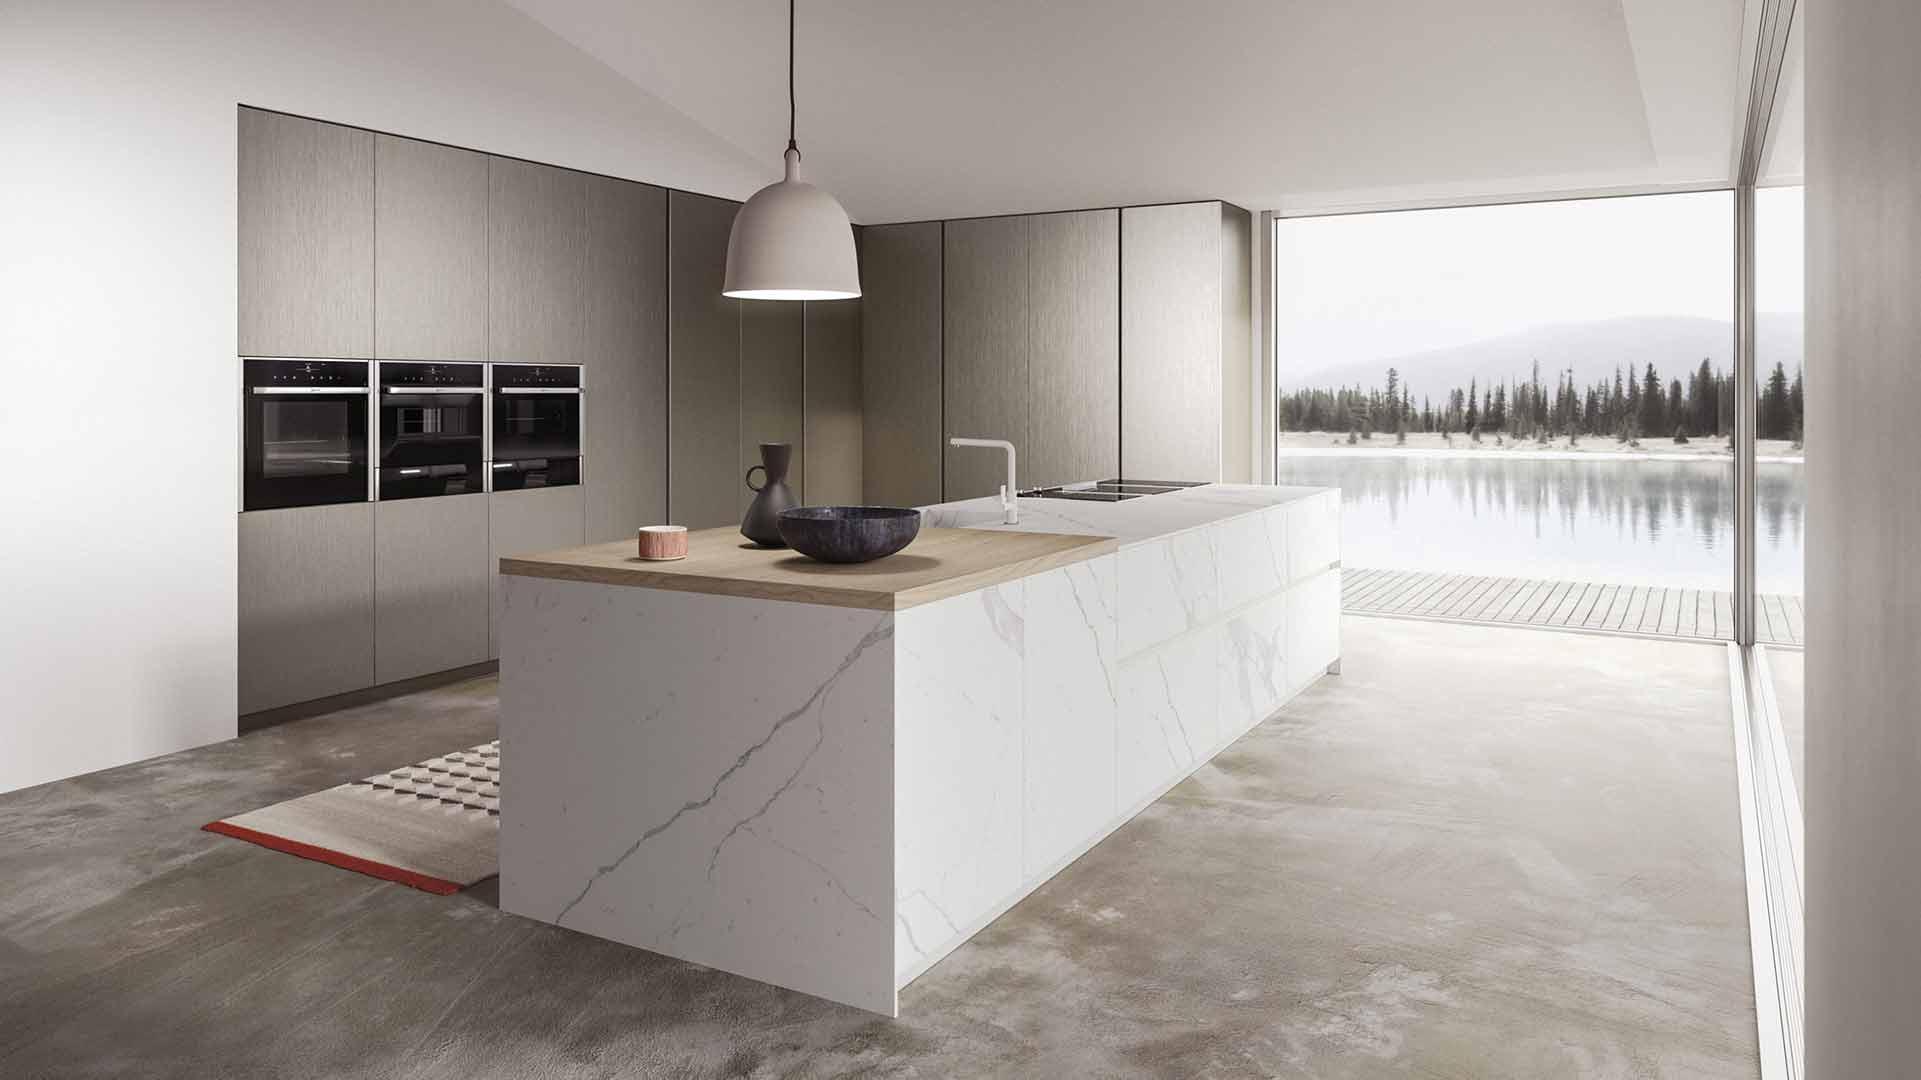 Cucina Statuario & Metalescente